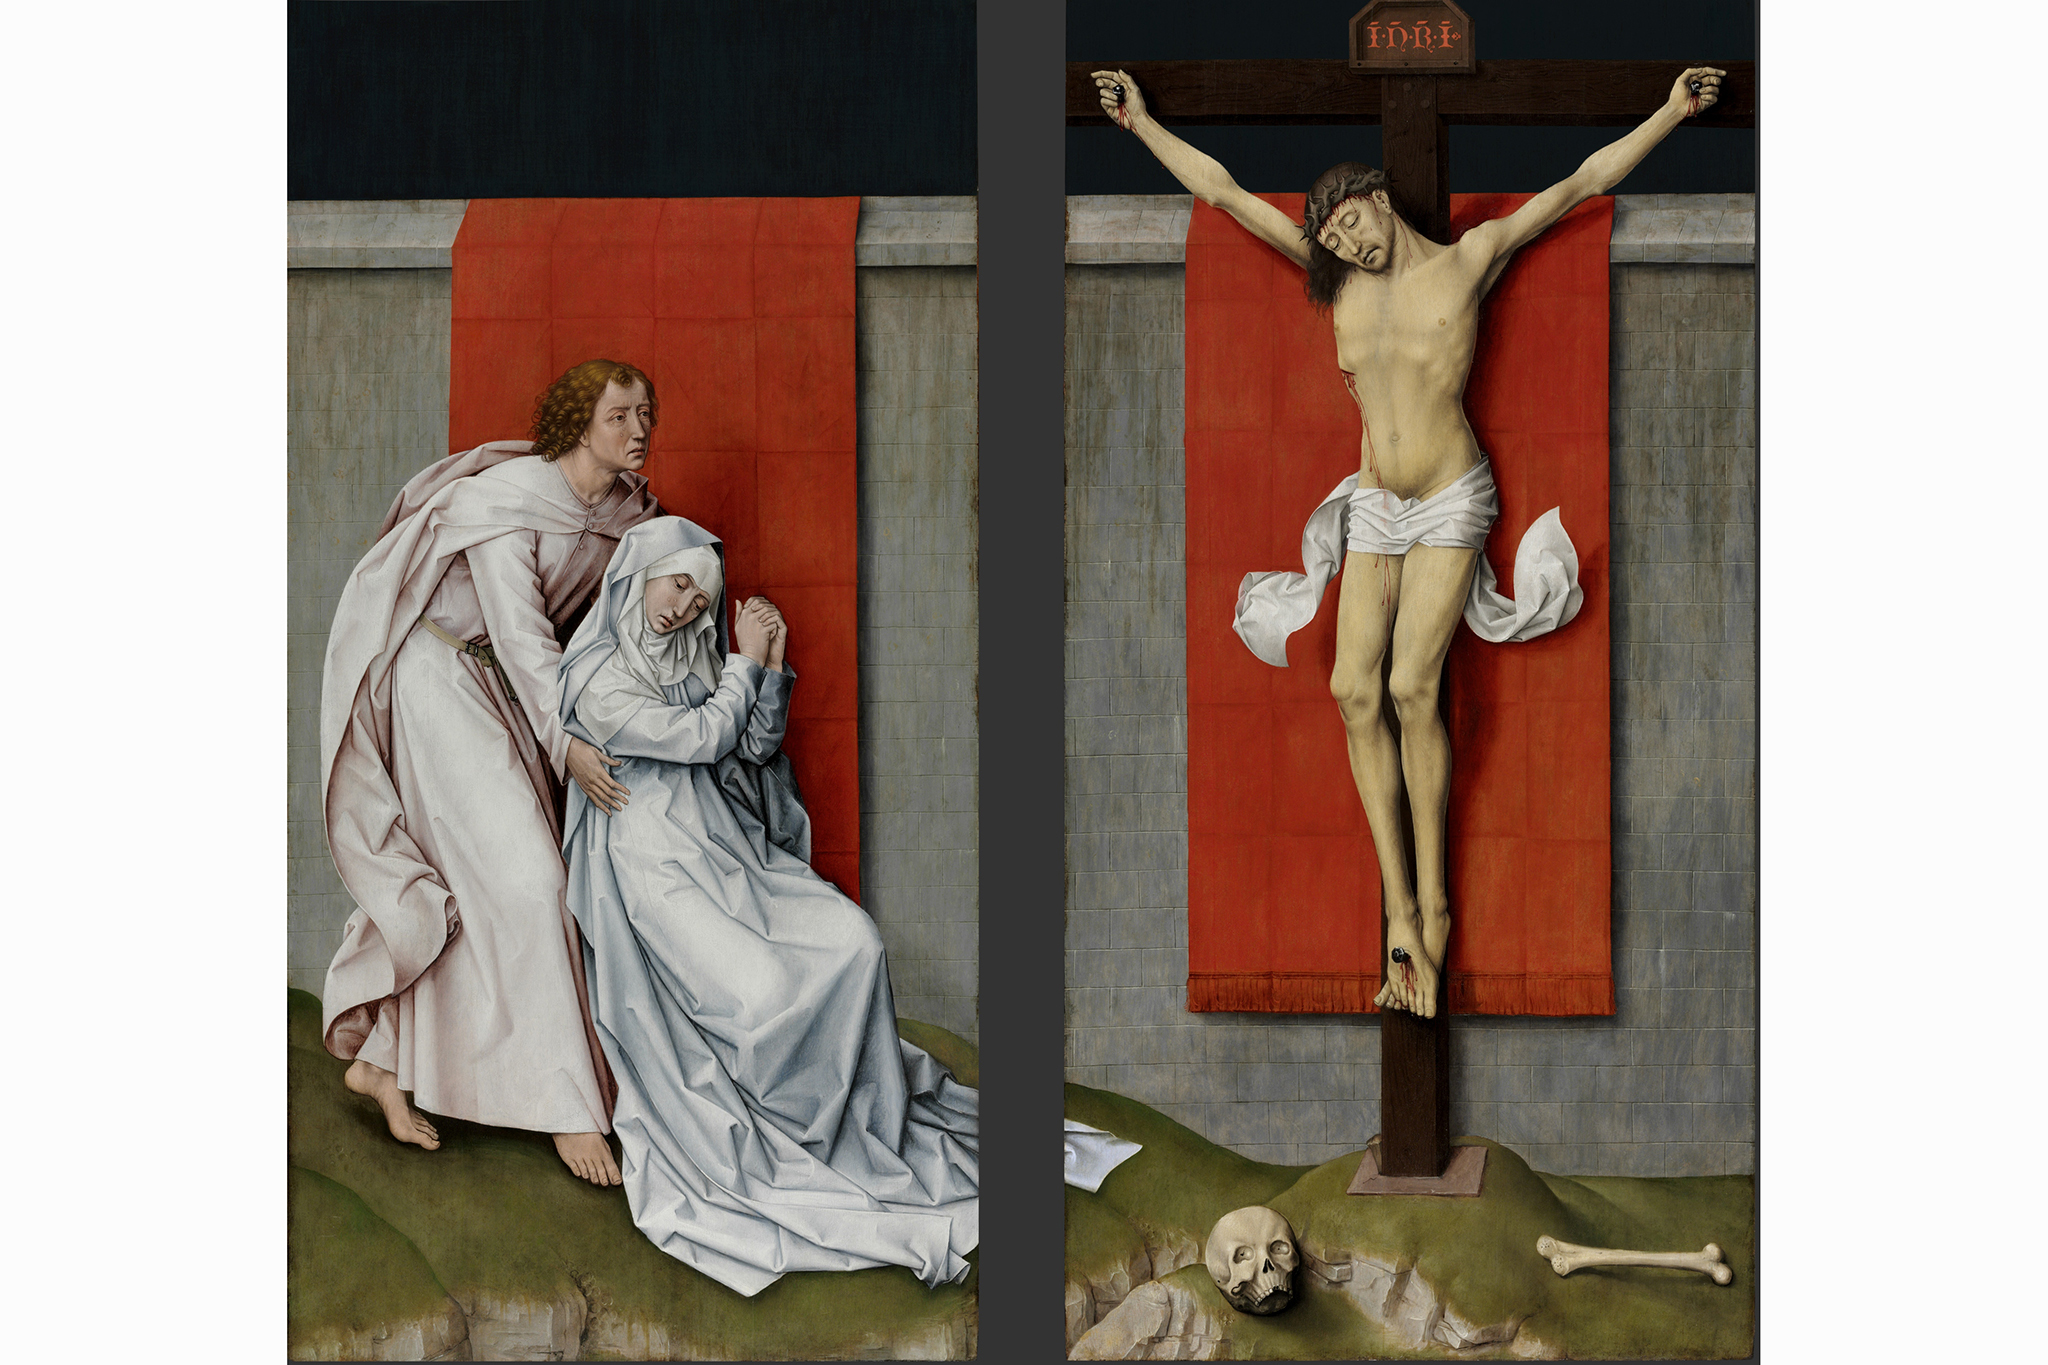 Rogier van der Weyden, The Crucifixion, with the Virgin and Sain